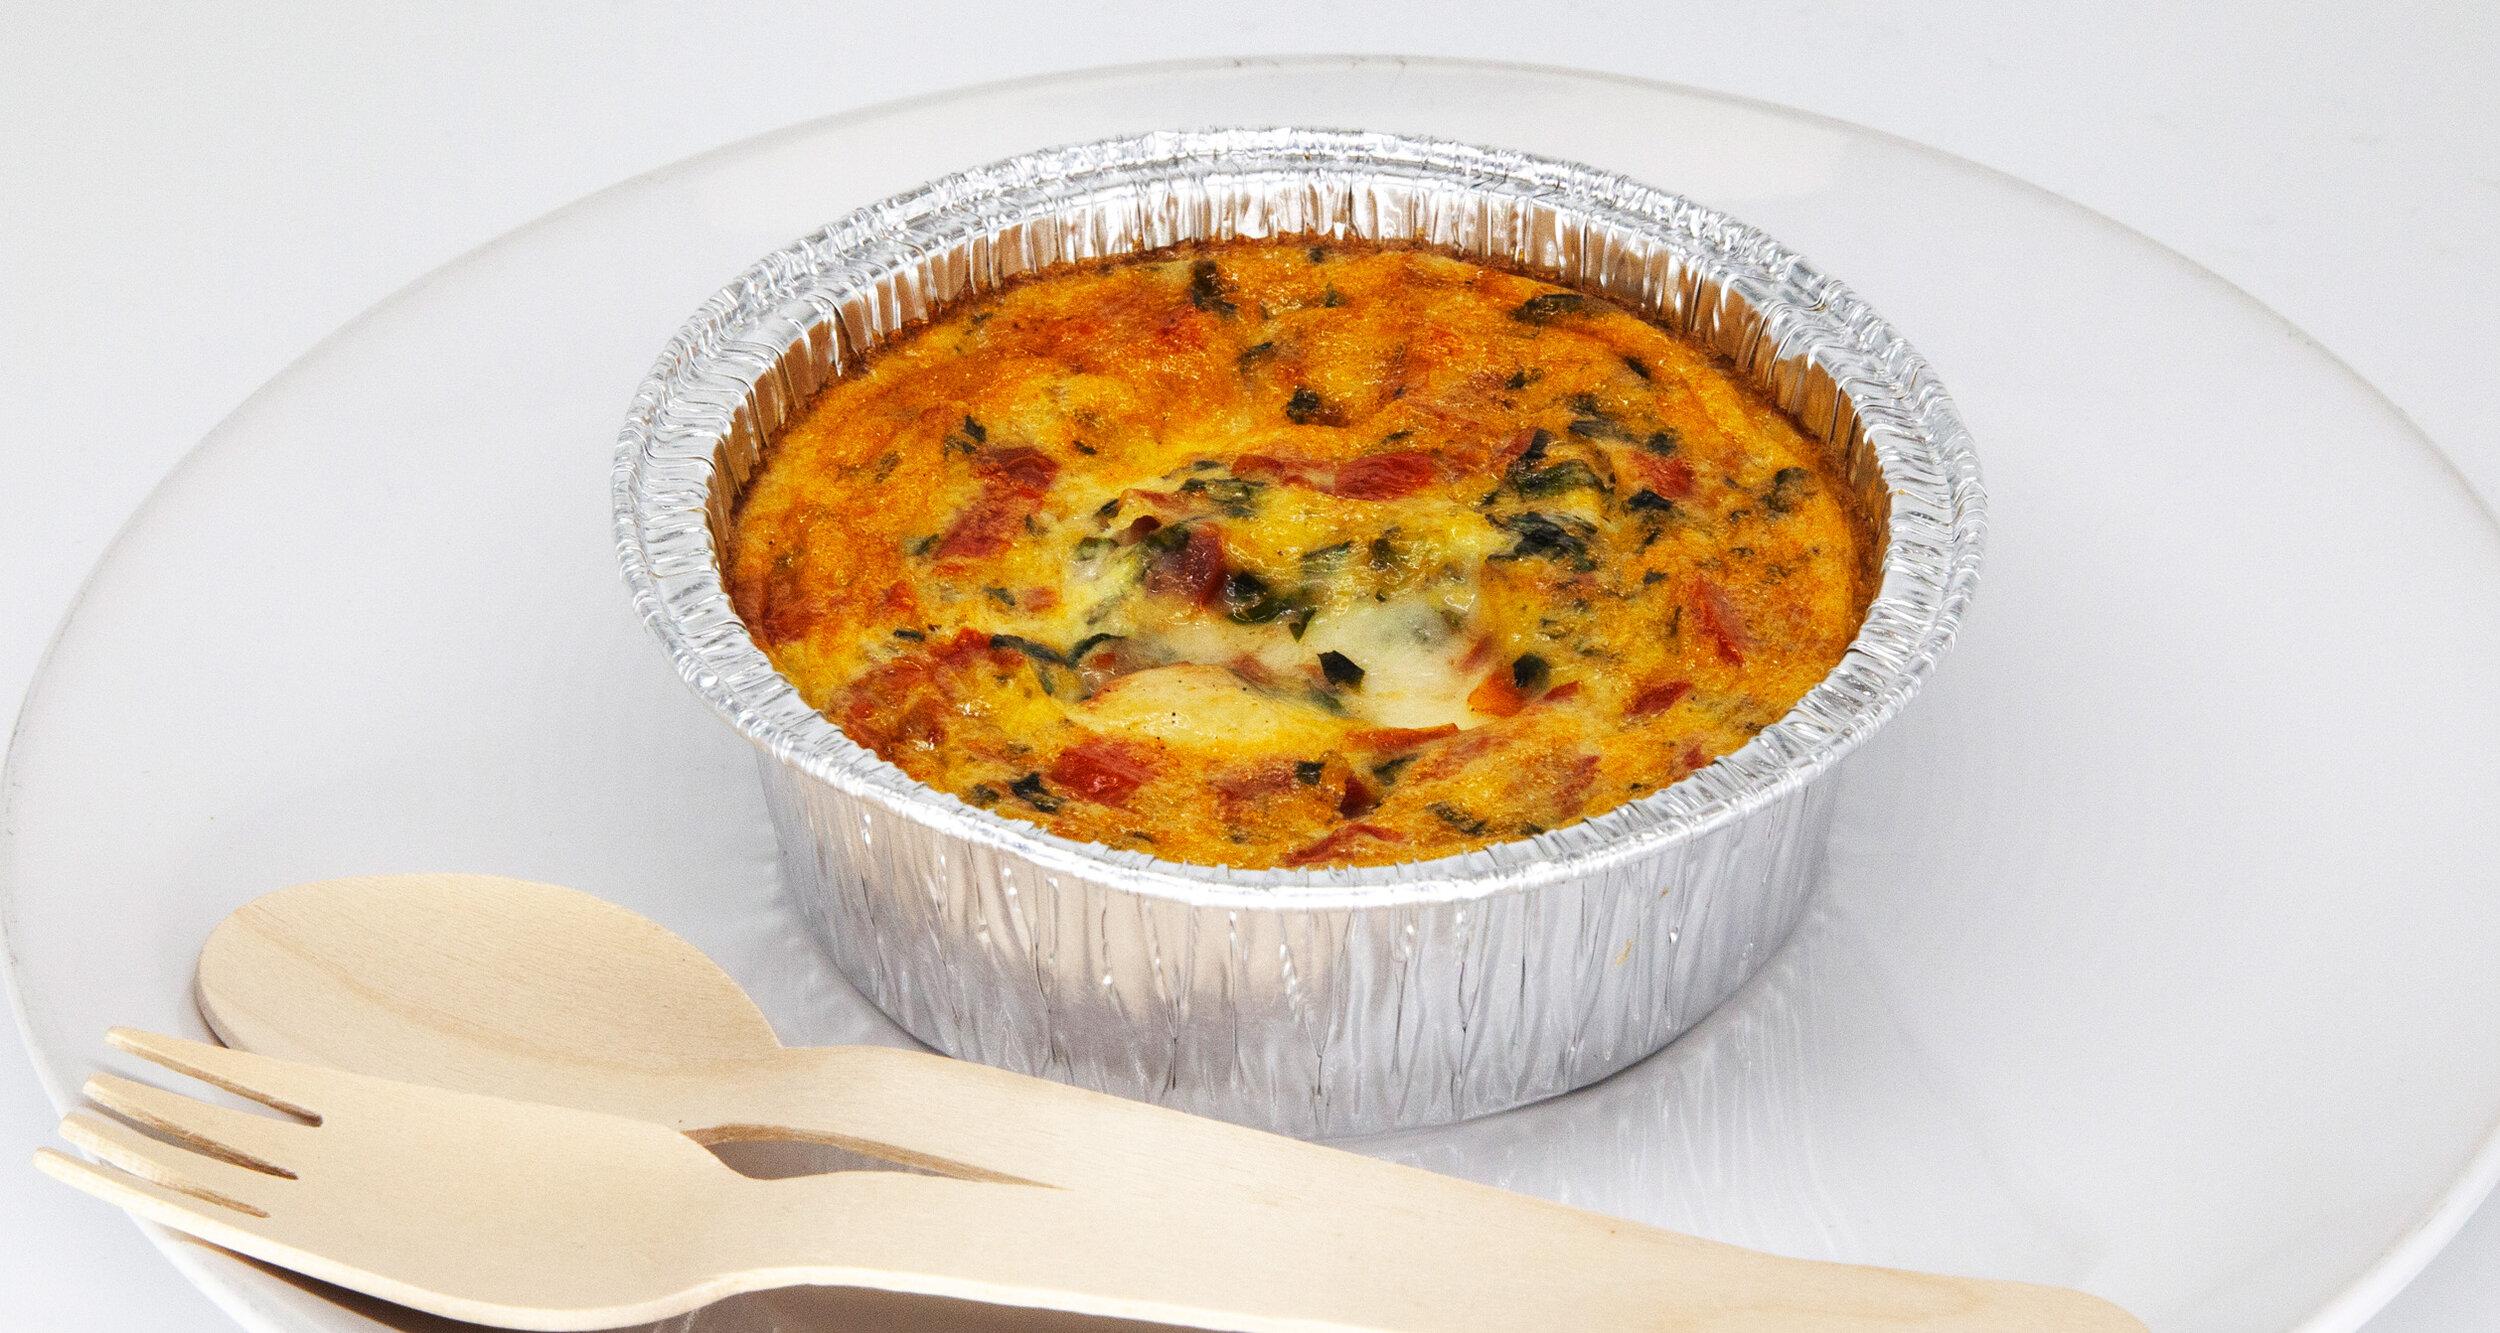 MOZZARELLA EGG MUFFIN - 256.5 KCAL PER SERVINGEgg, basil, mozzarella, tomato, salt, pepper$23